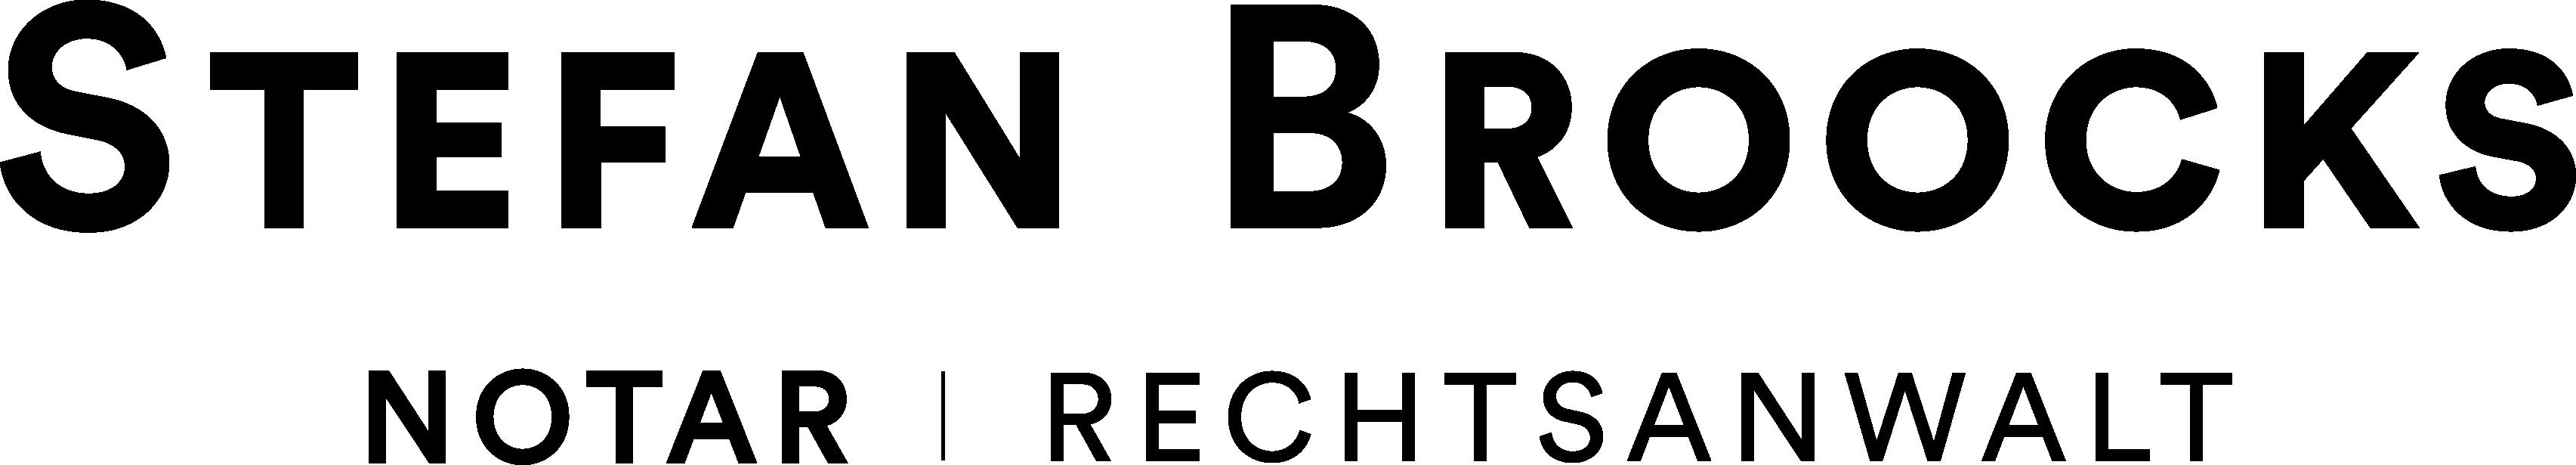 broocks_logo_neu